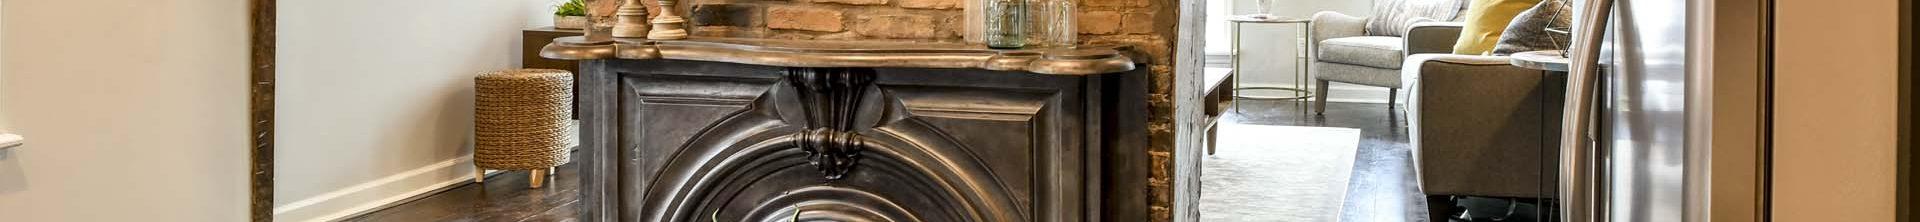 Louisville Home Staging, Louisville Interior Design, Louisville Renovation Design, Louisville Kitchen Design, Black Kitchen Cabinetry, Stainless vent hood, reclaimed hardwood flooring, artwork, accessories, kitchen island, granite countertops, stainless appliances, gas range, kitchen fireplace, brick fireplace